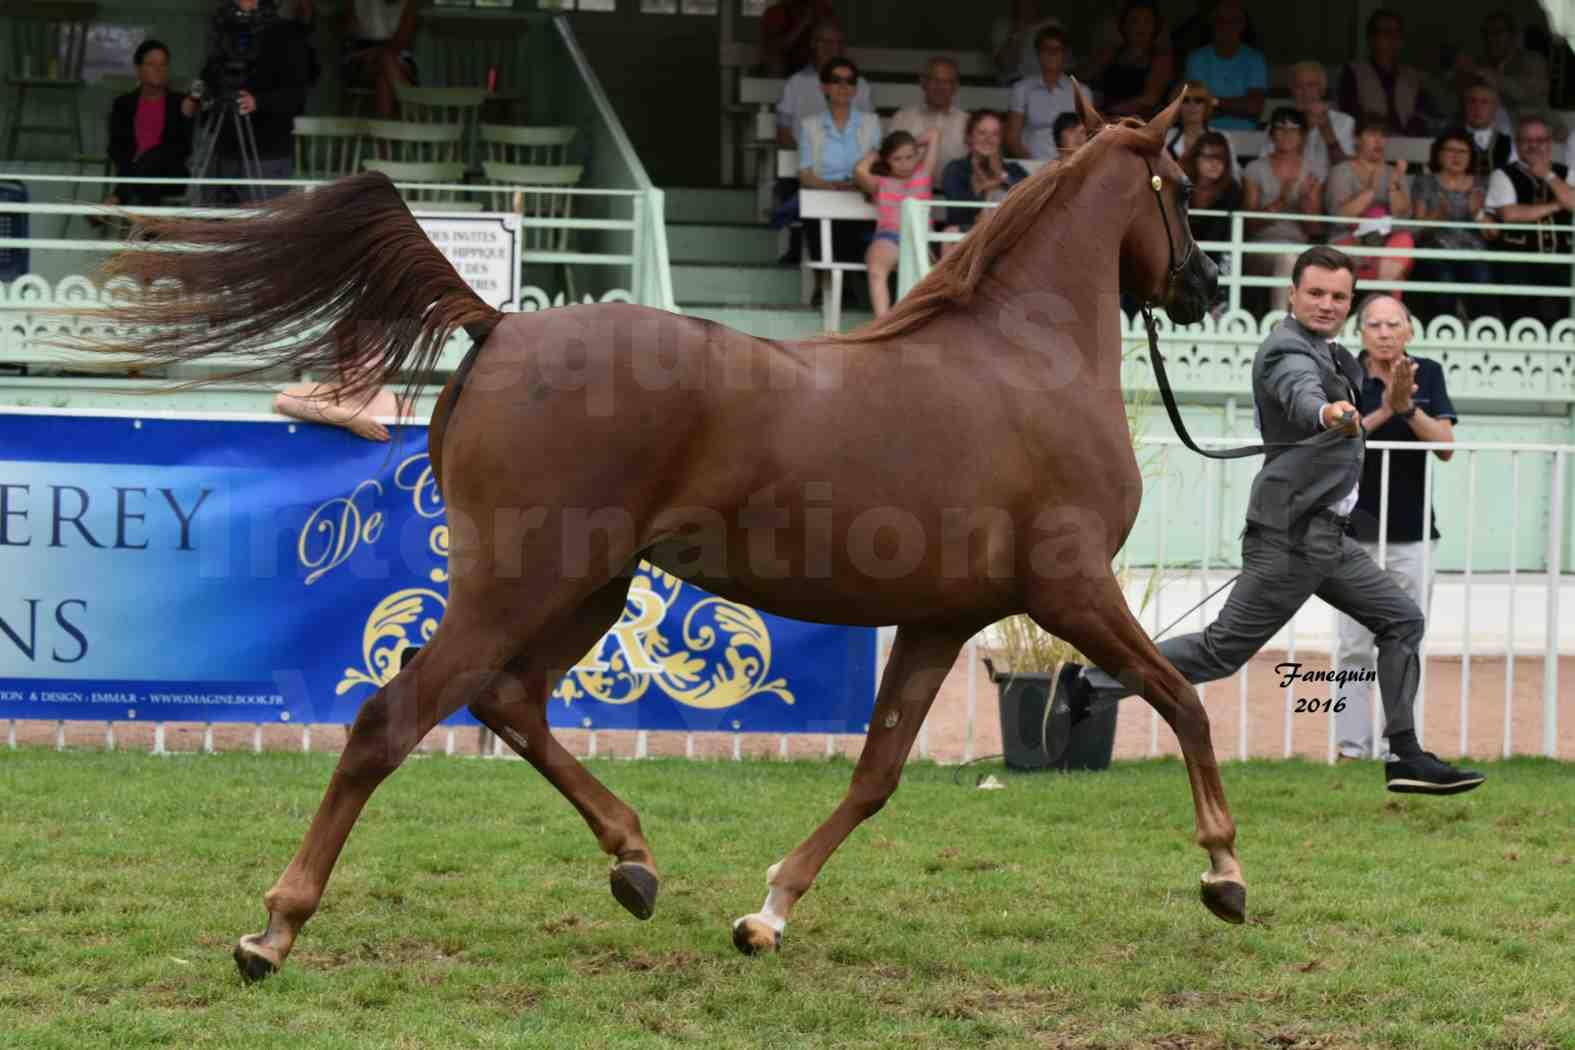 International Arabian Horse Show B de VICHY 2016 - PEARL DE DJOON - Notre Sélection - 10